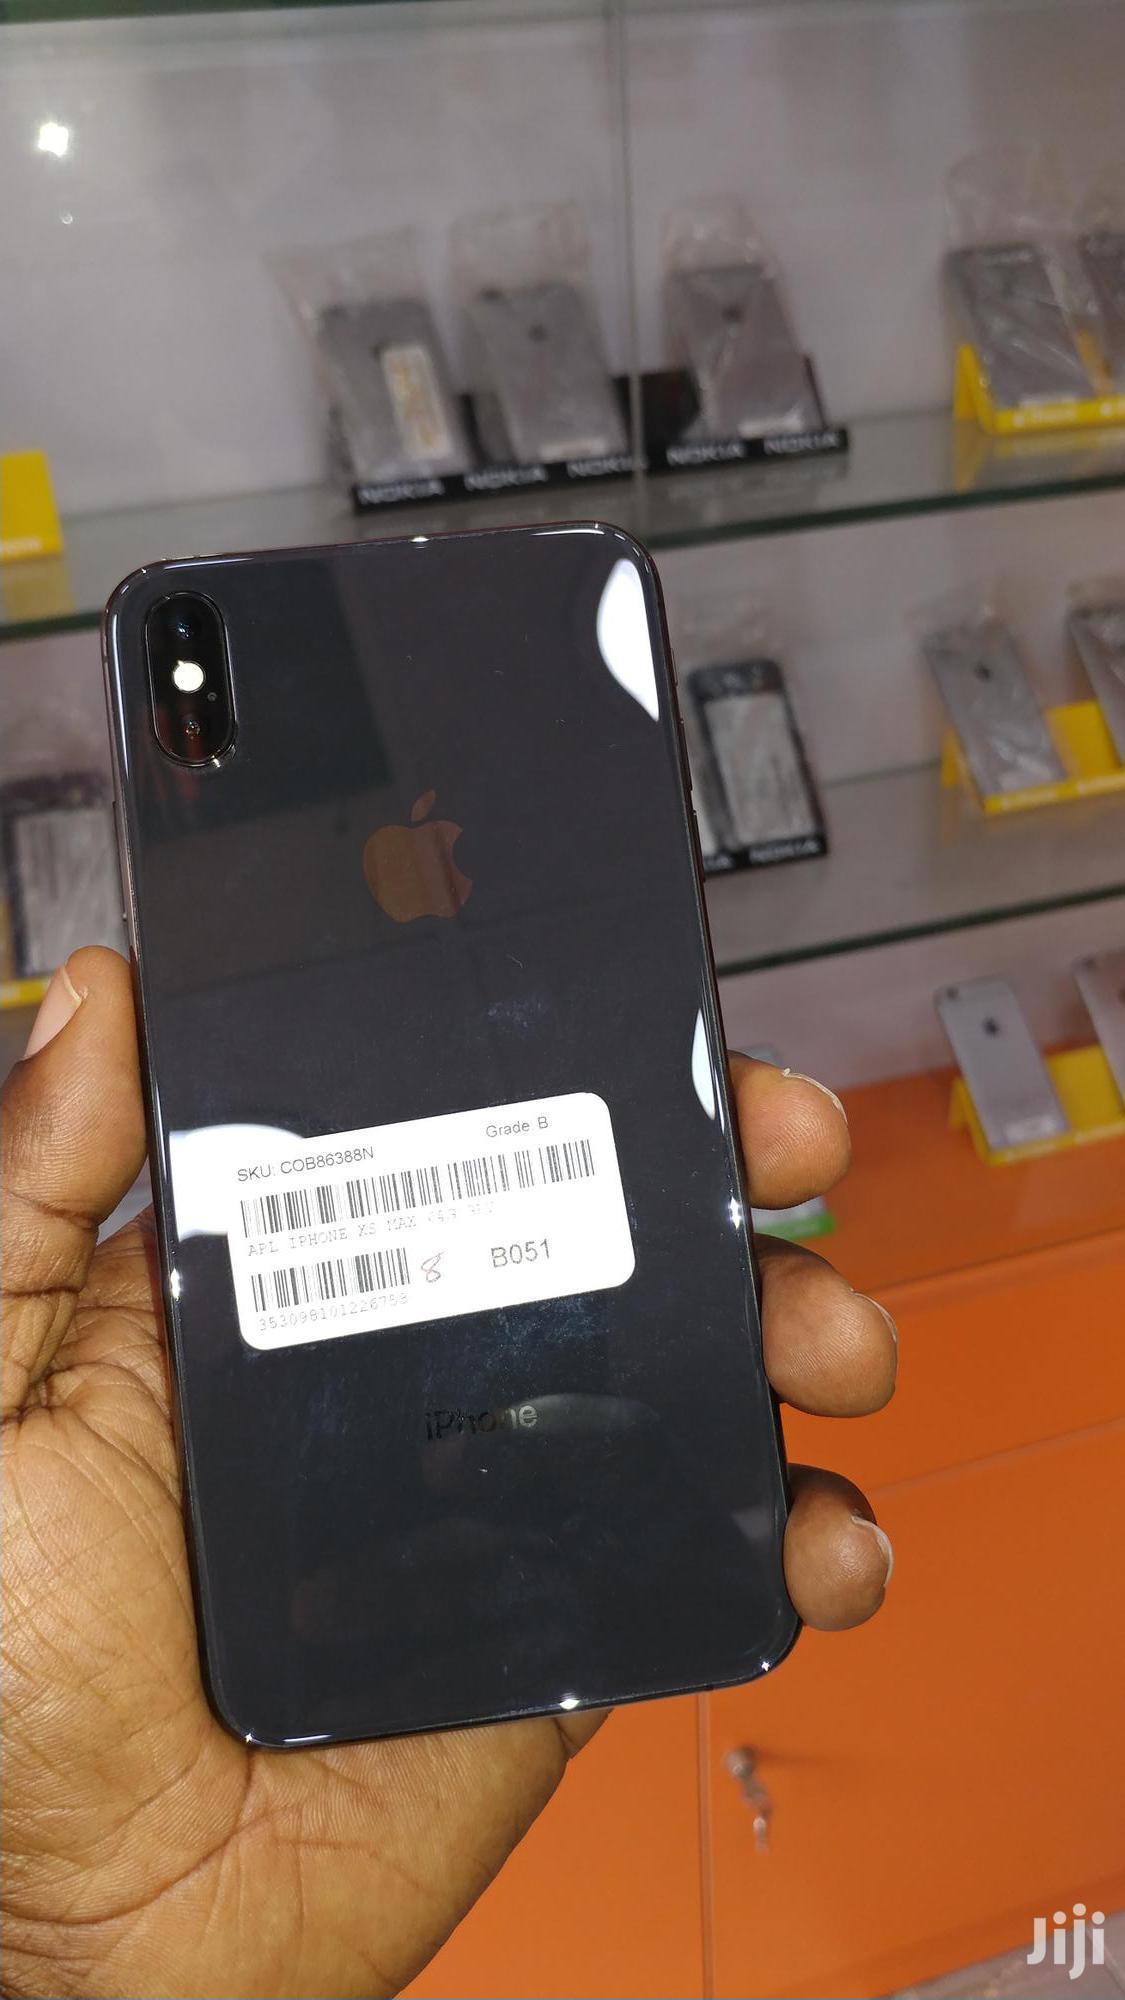 Apple iPhone XS Max 64 GB Gray